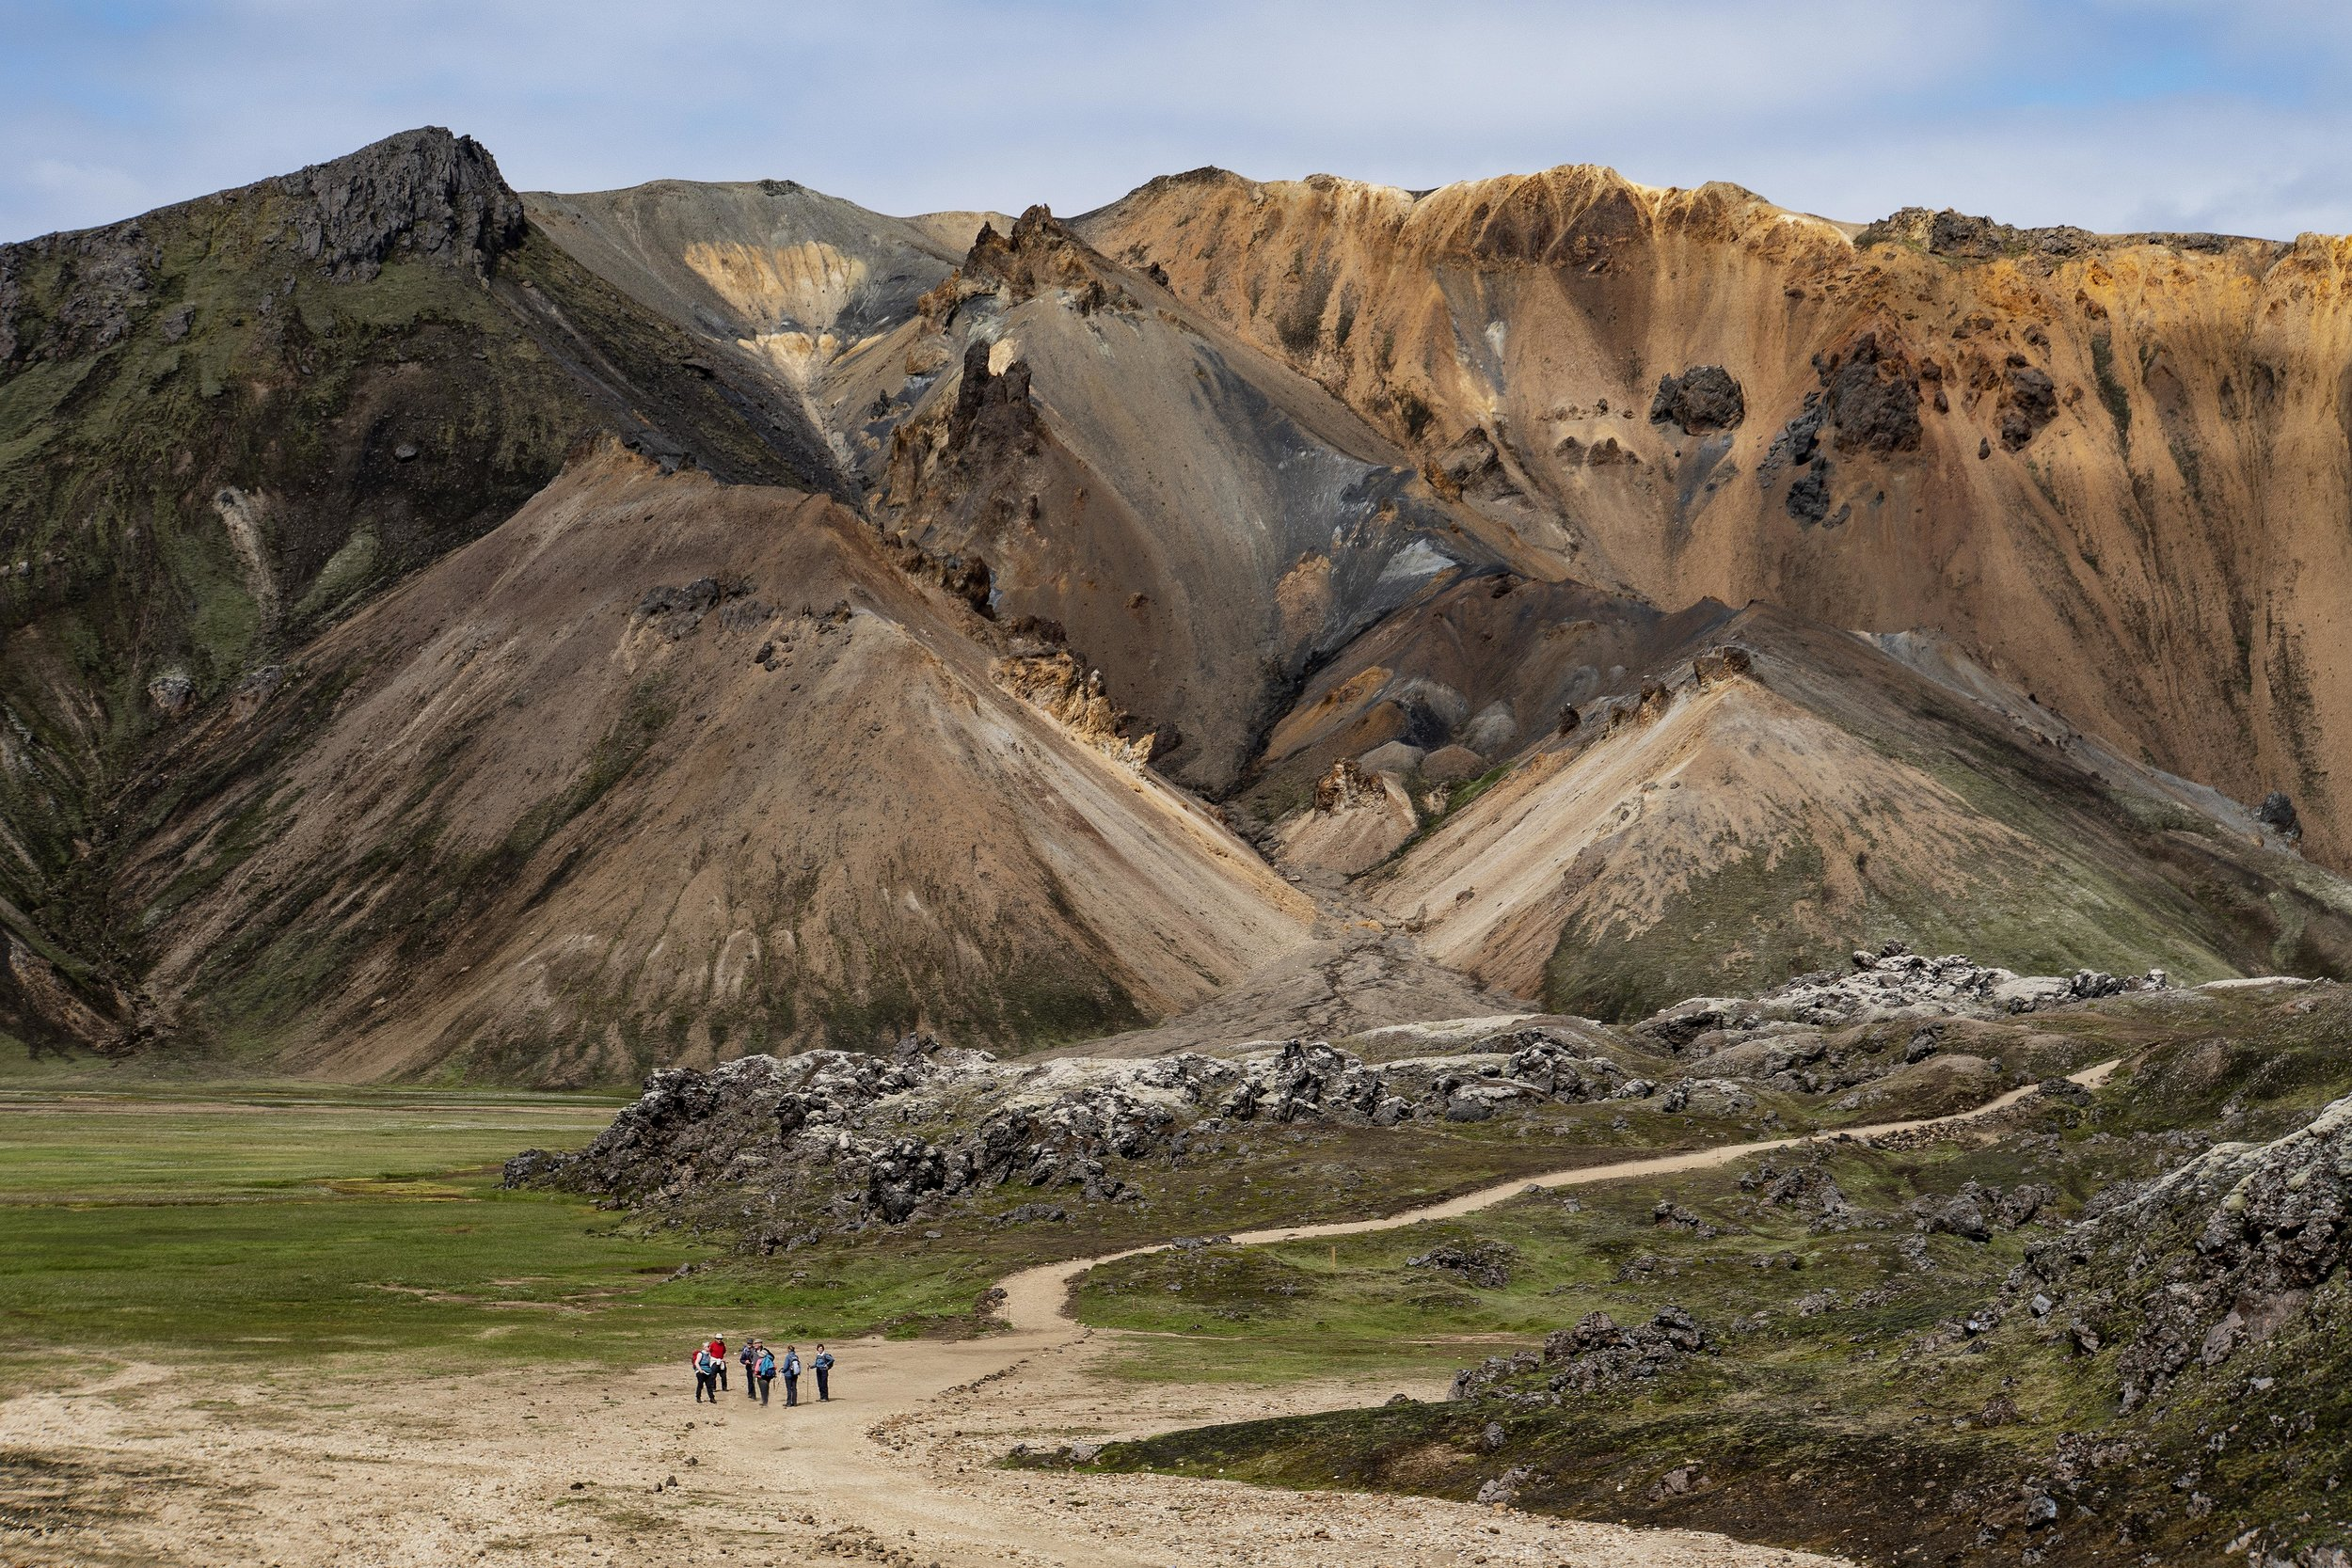 Graeme Dobbs - Iceland